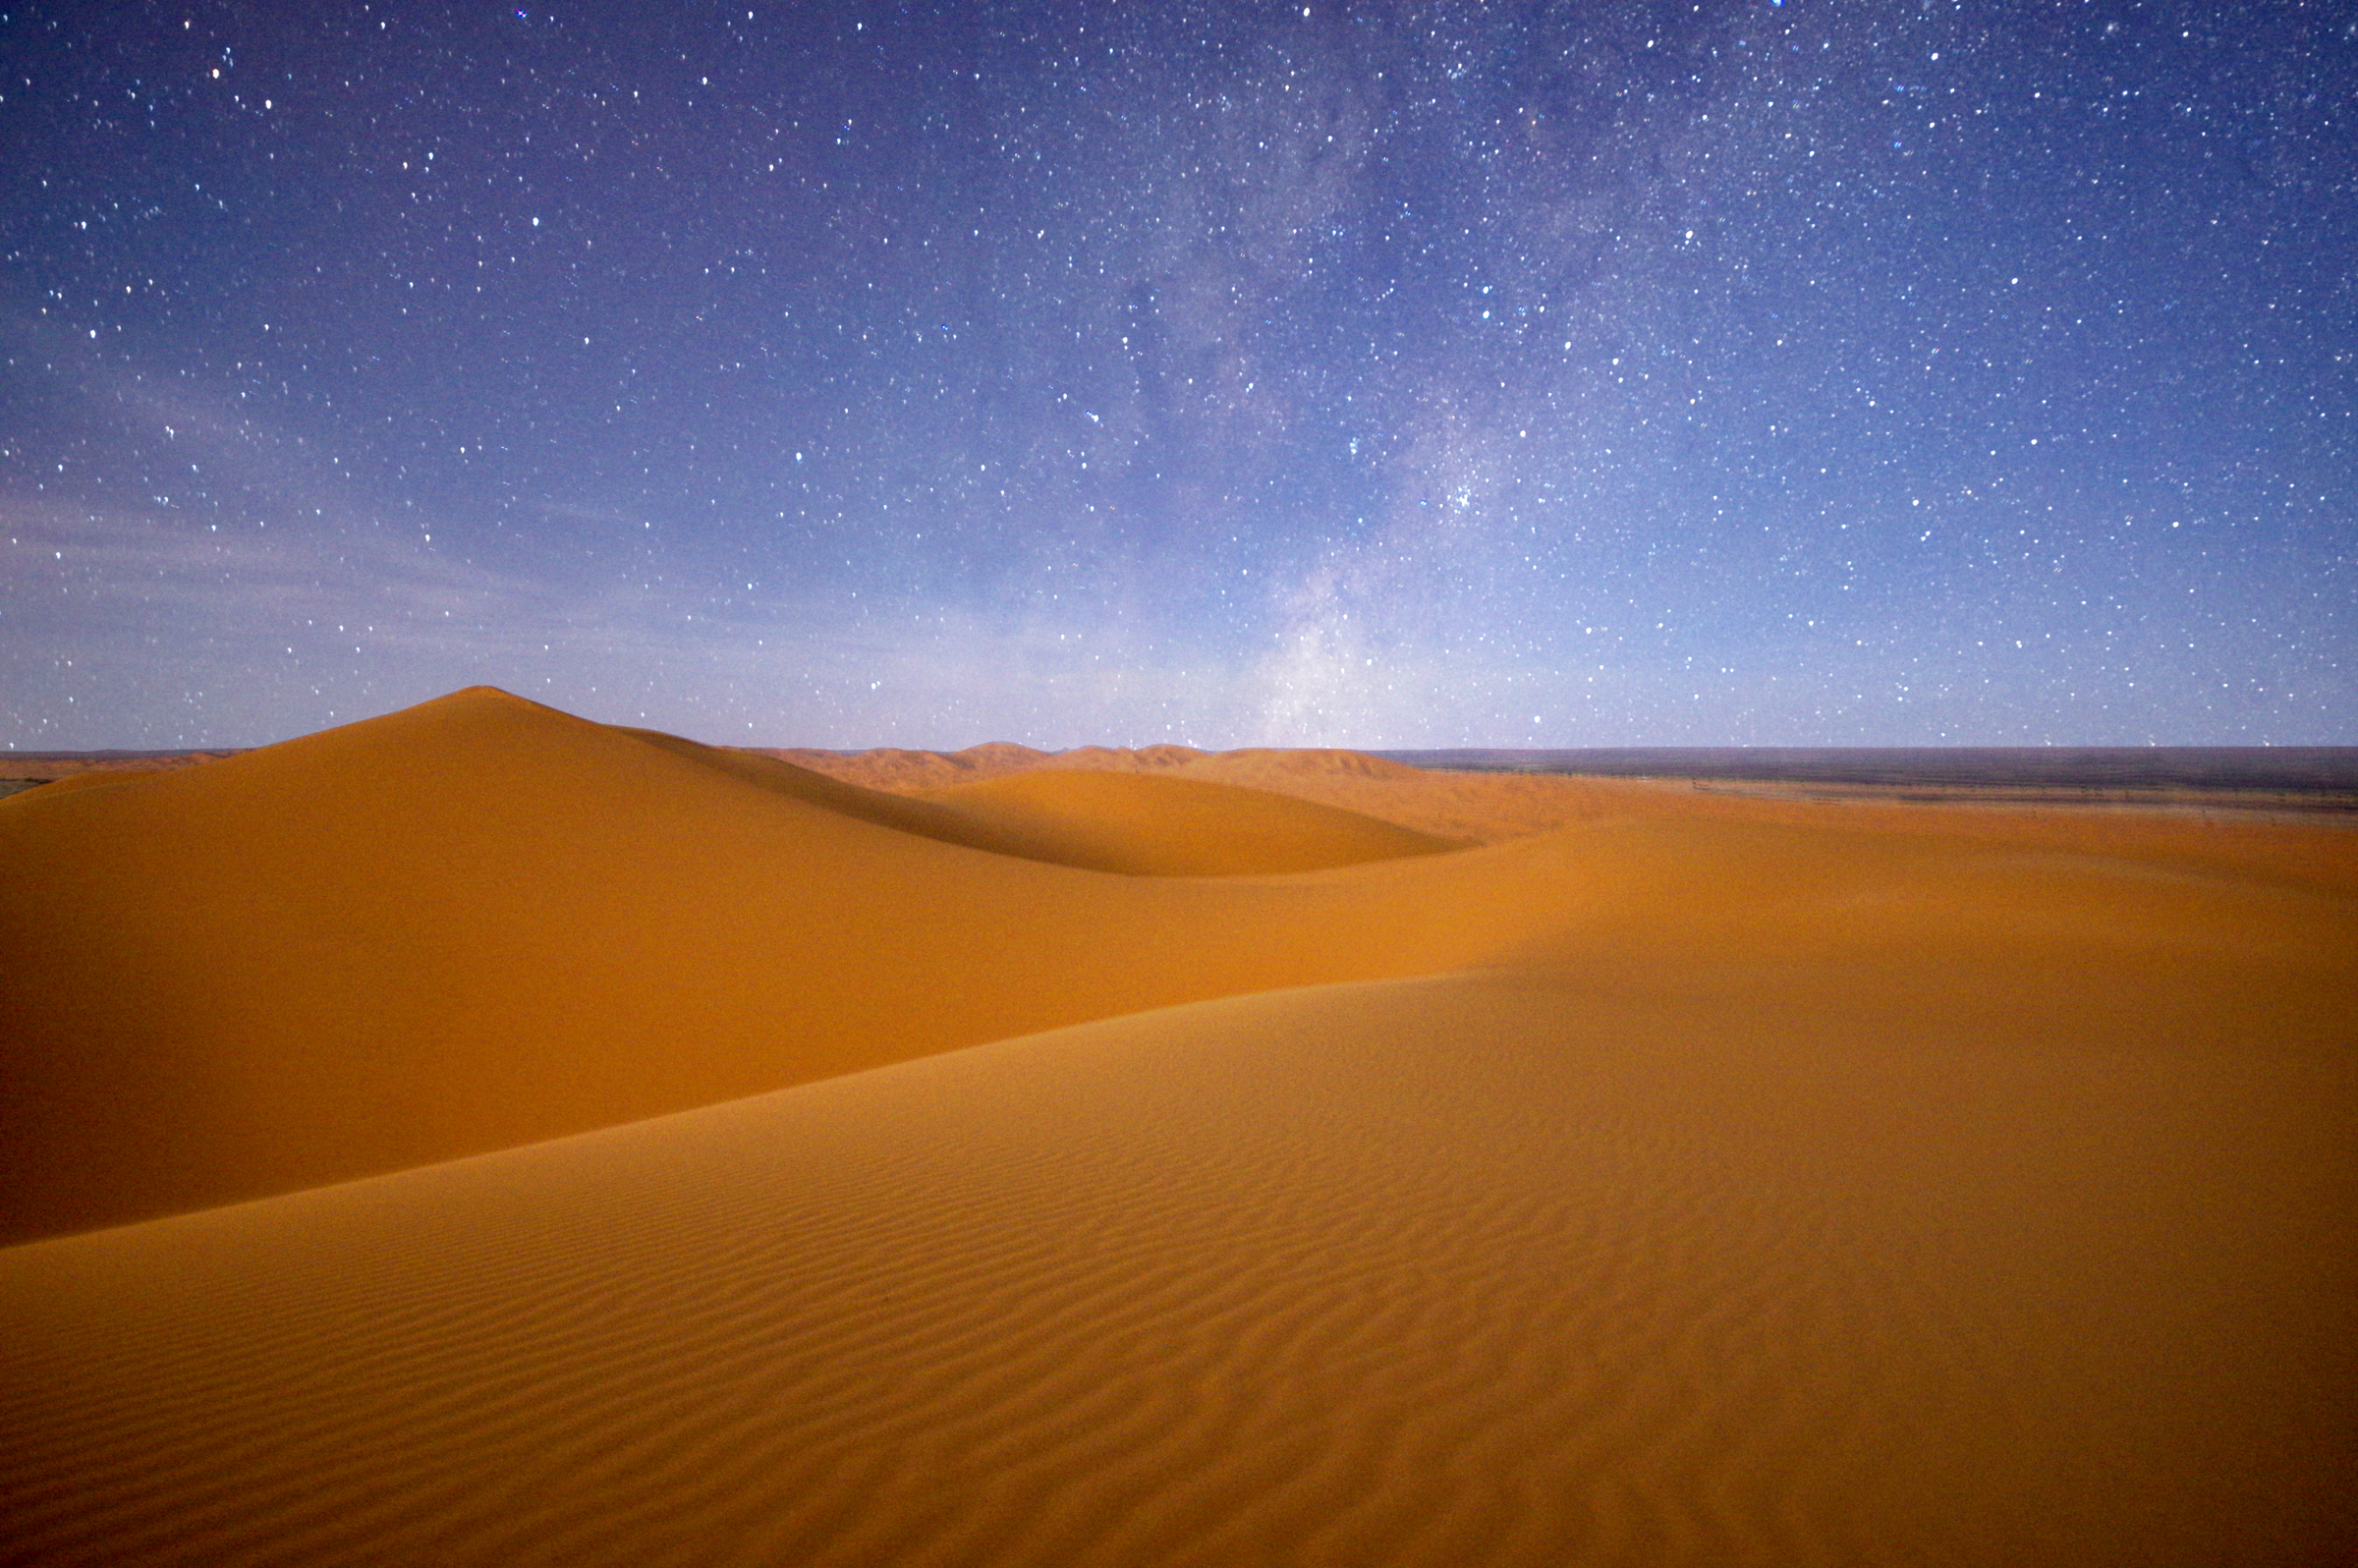 Sahara by Moonlight